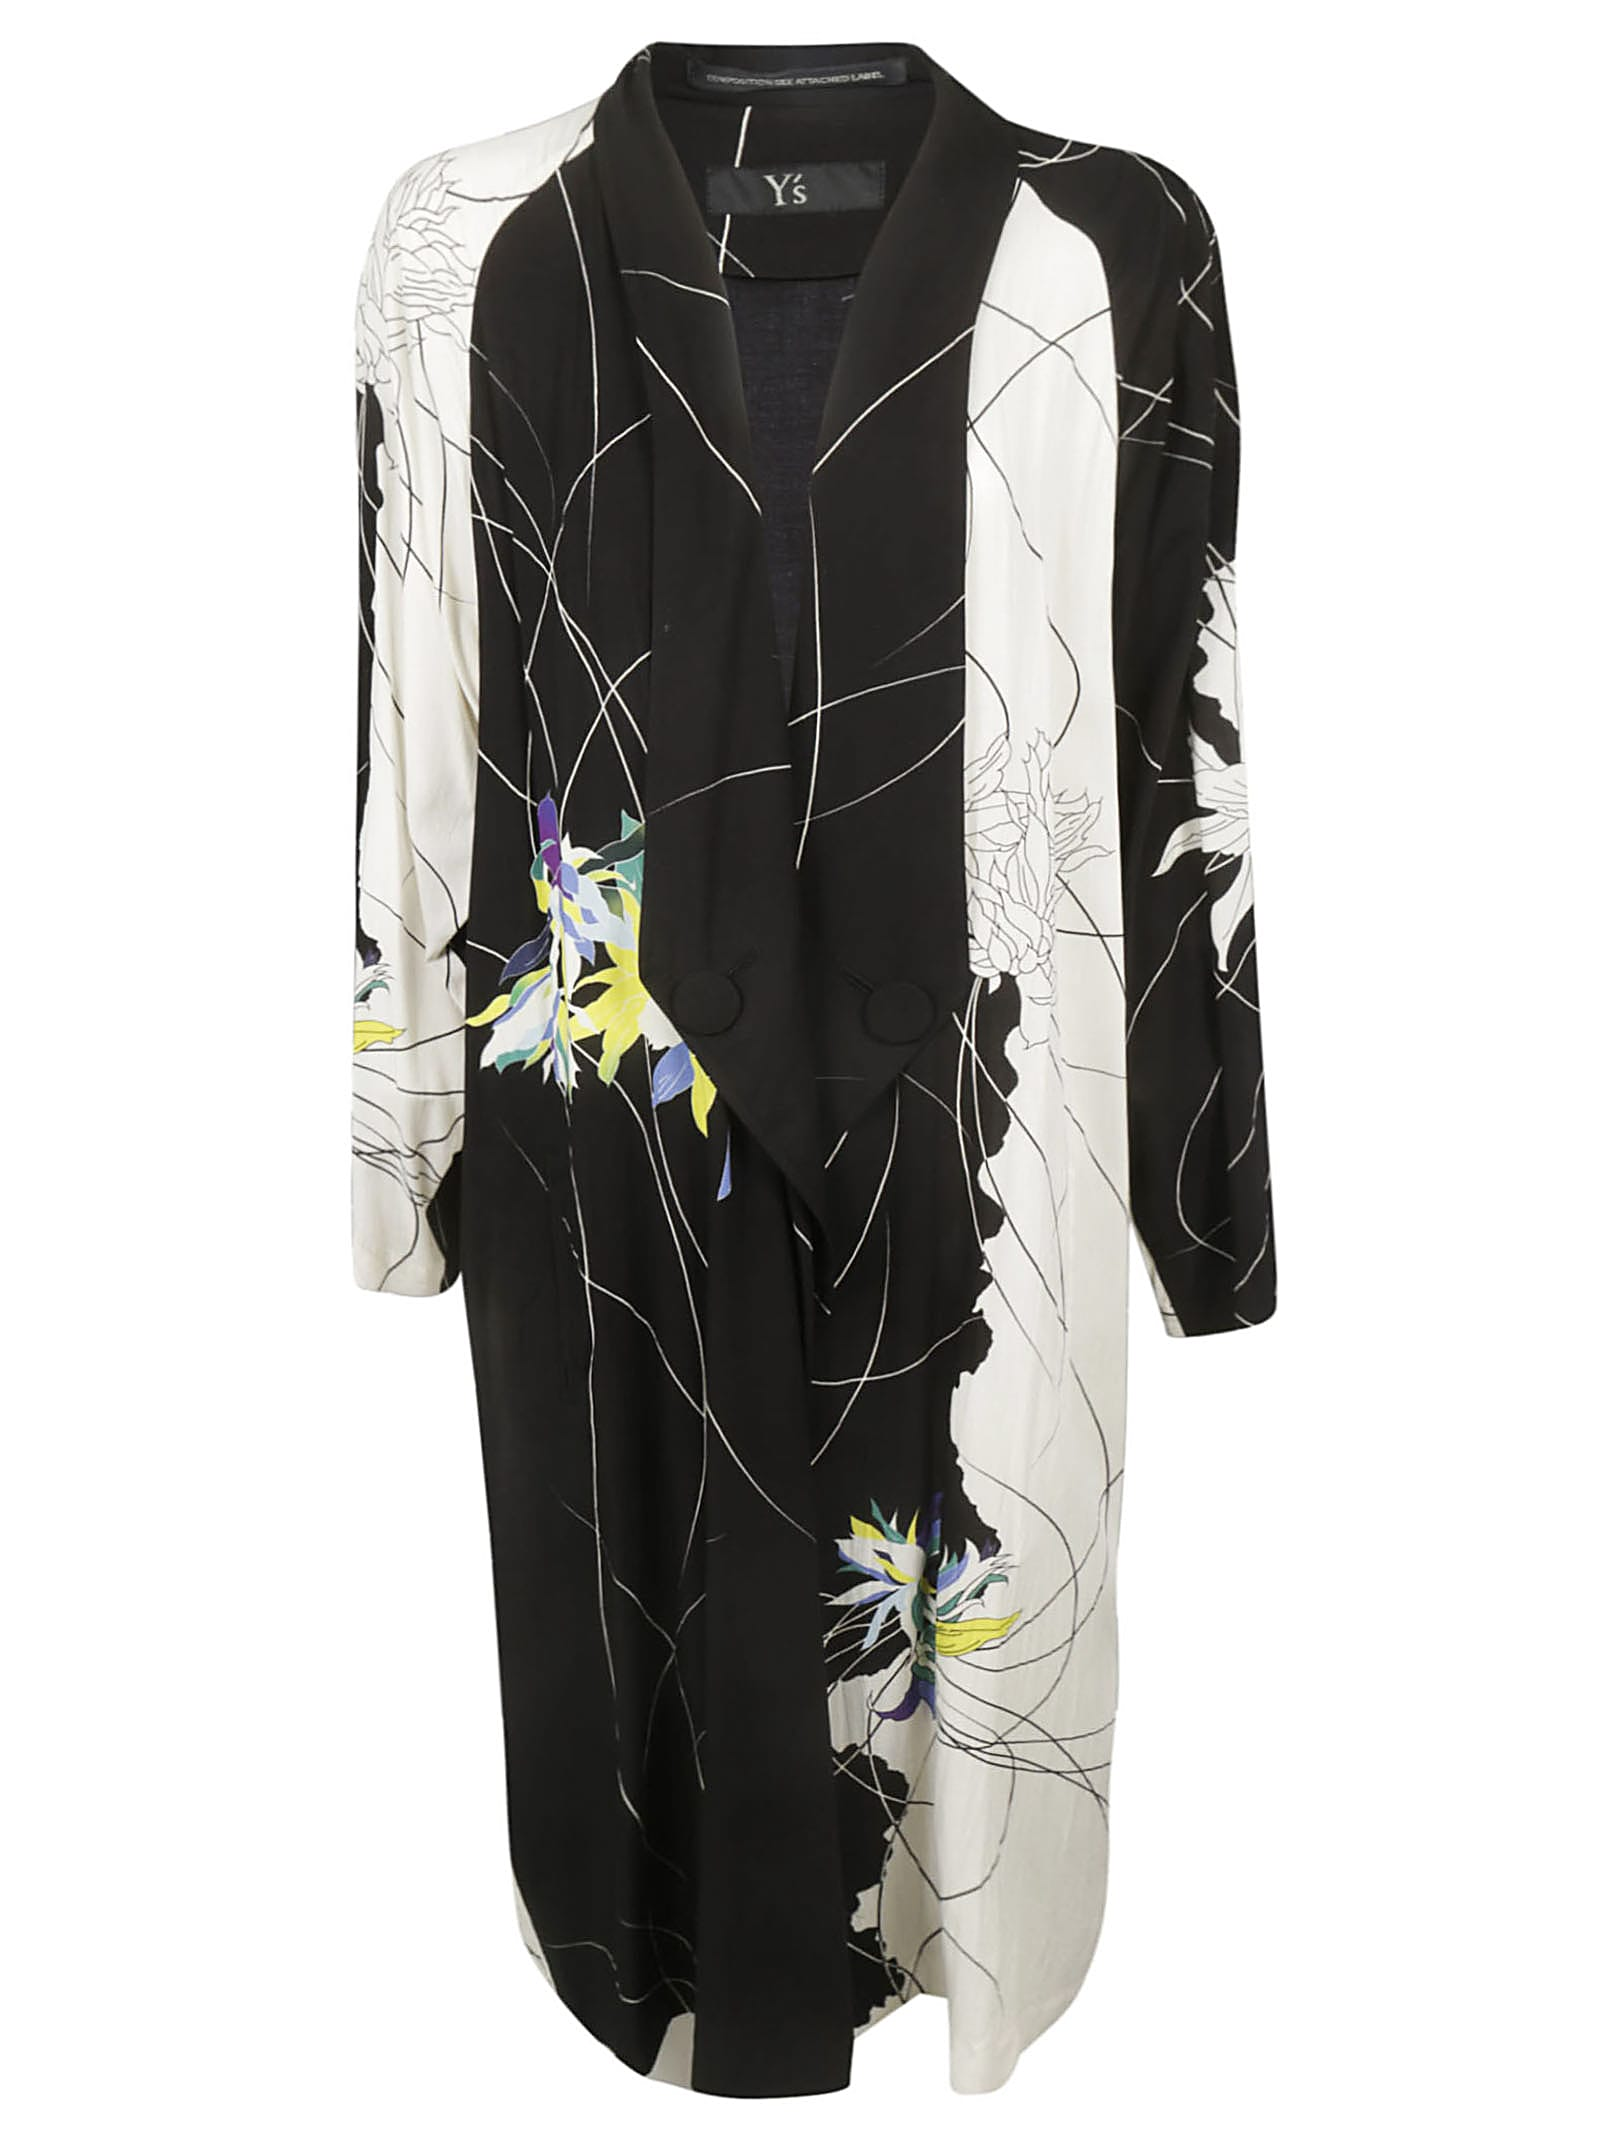 Ys Floral Print Long Coat